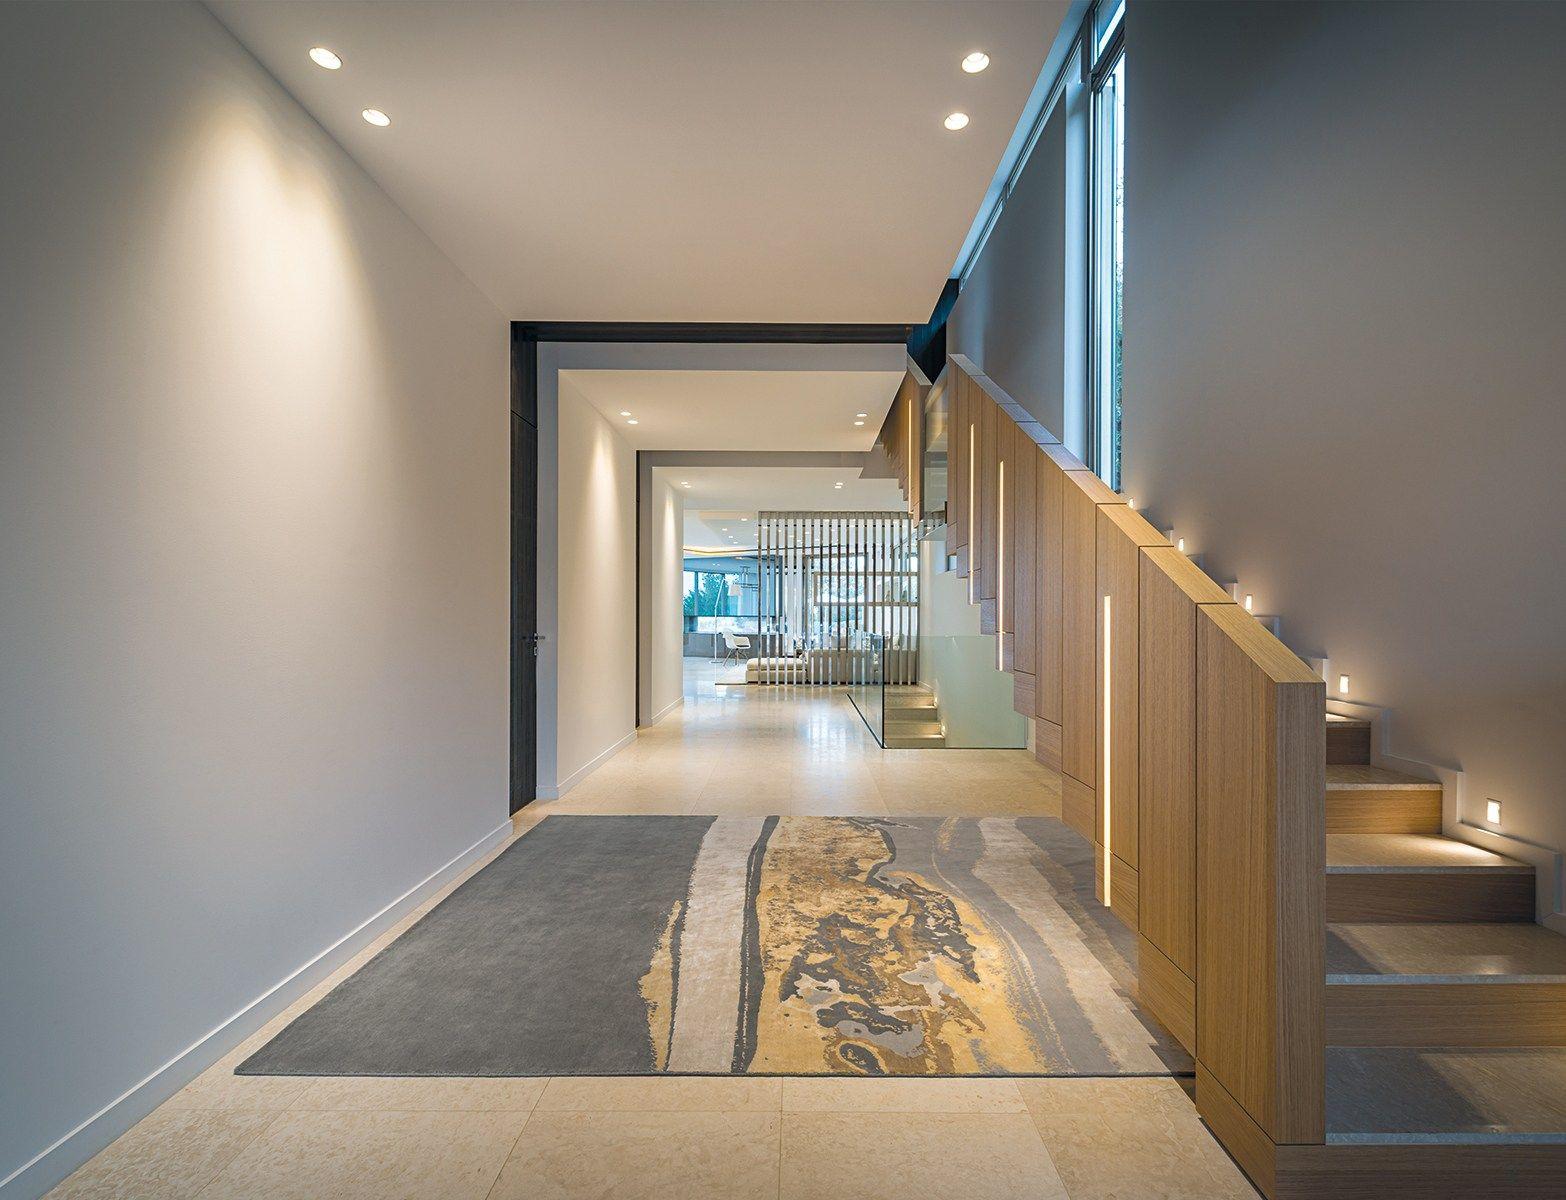 edition bougainville at maison objet. Black Bedroom Furniture Sets. Home Design Ideas